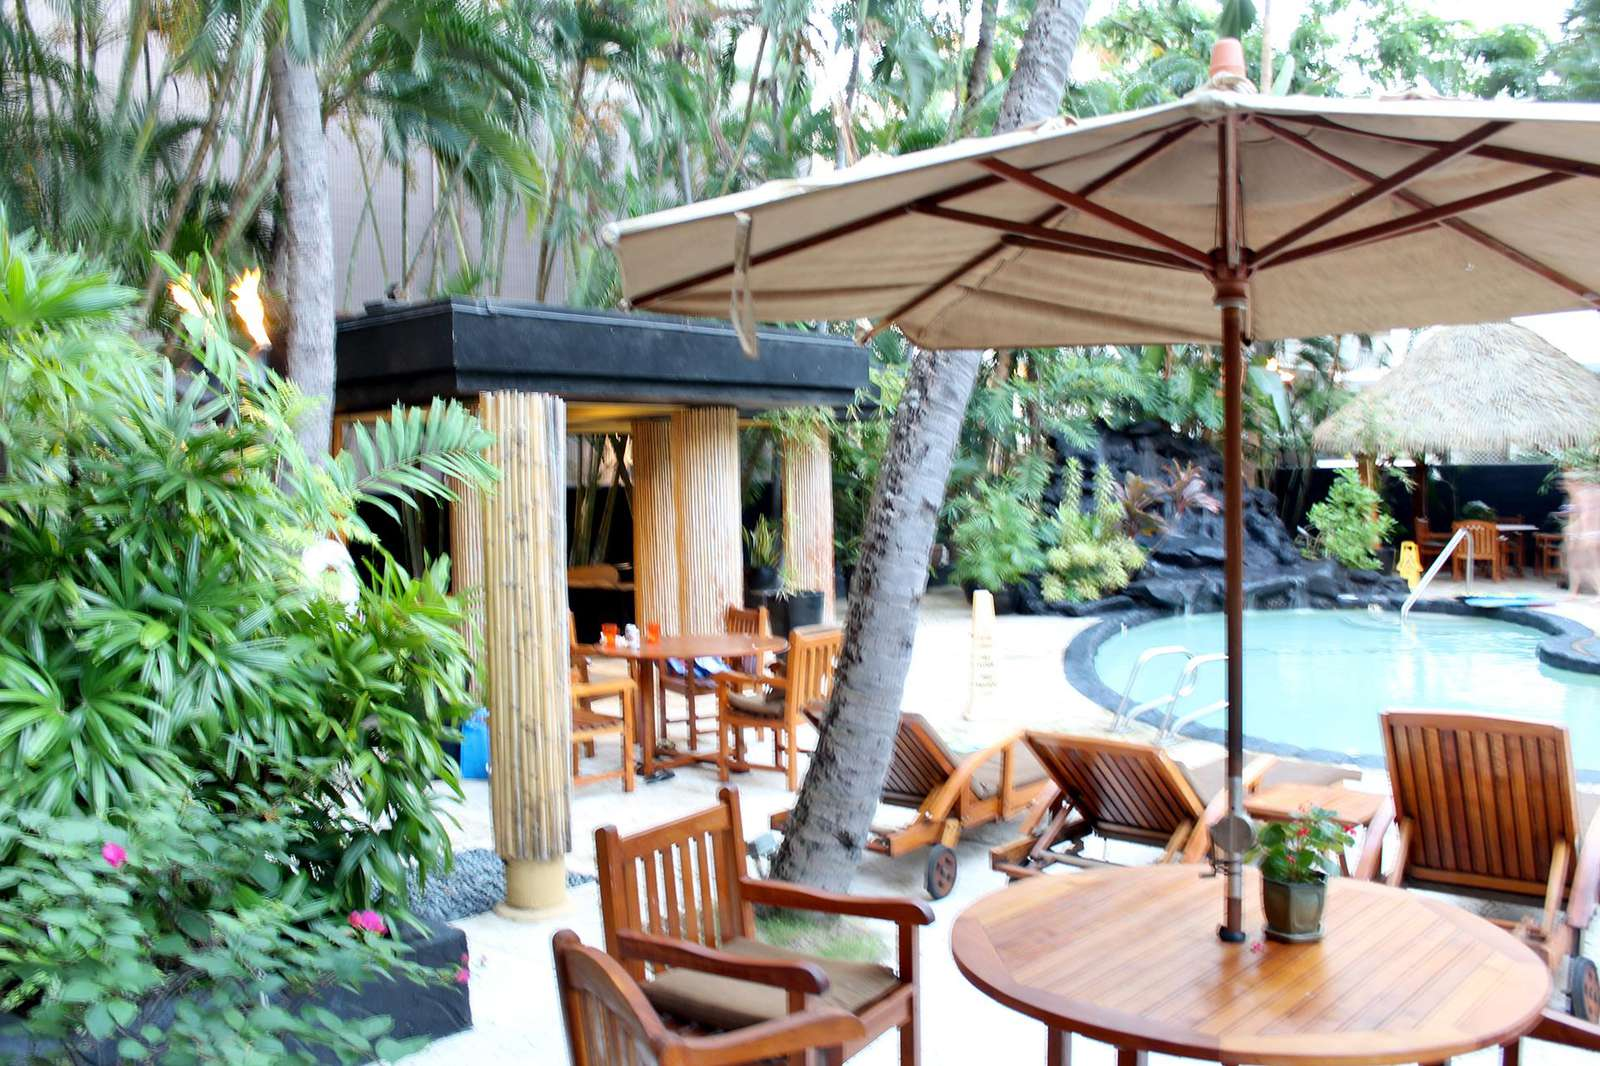 Outdoor communal sundeck around pool